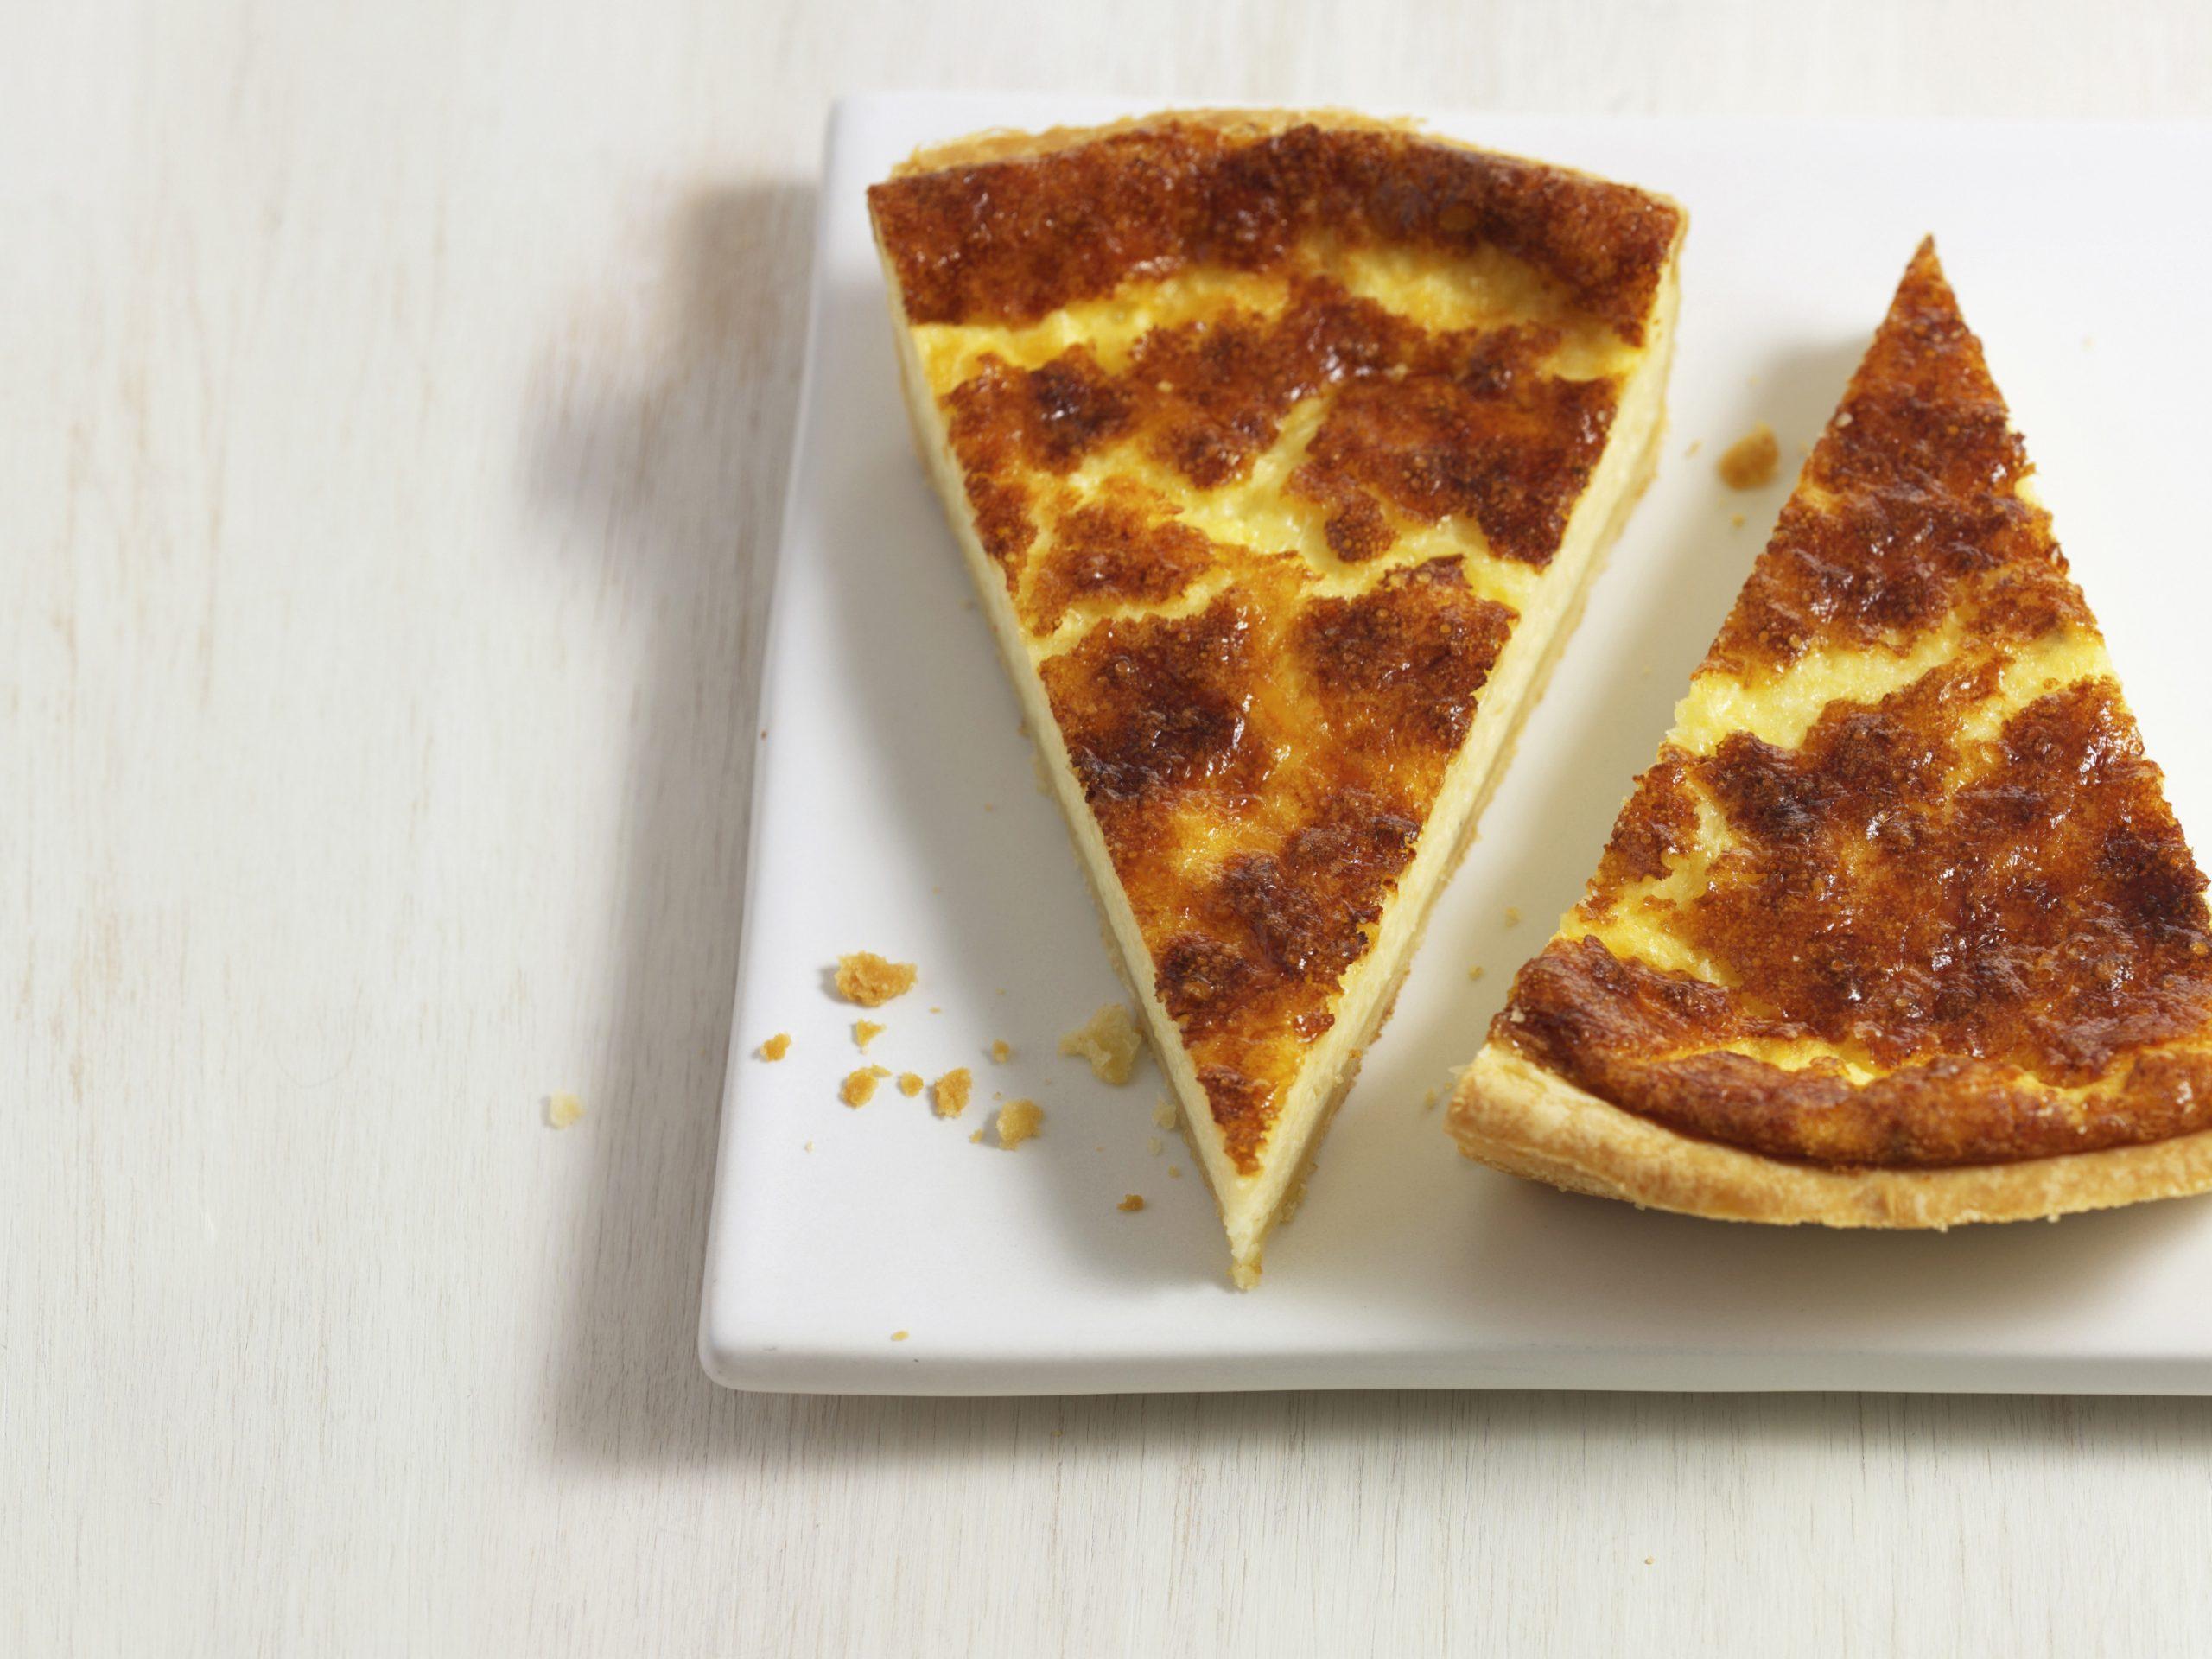 Gâteau au fromage classique